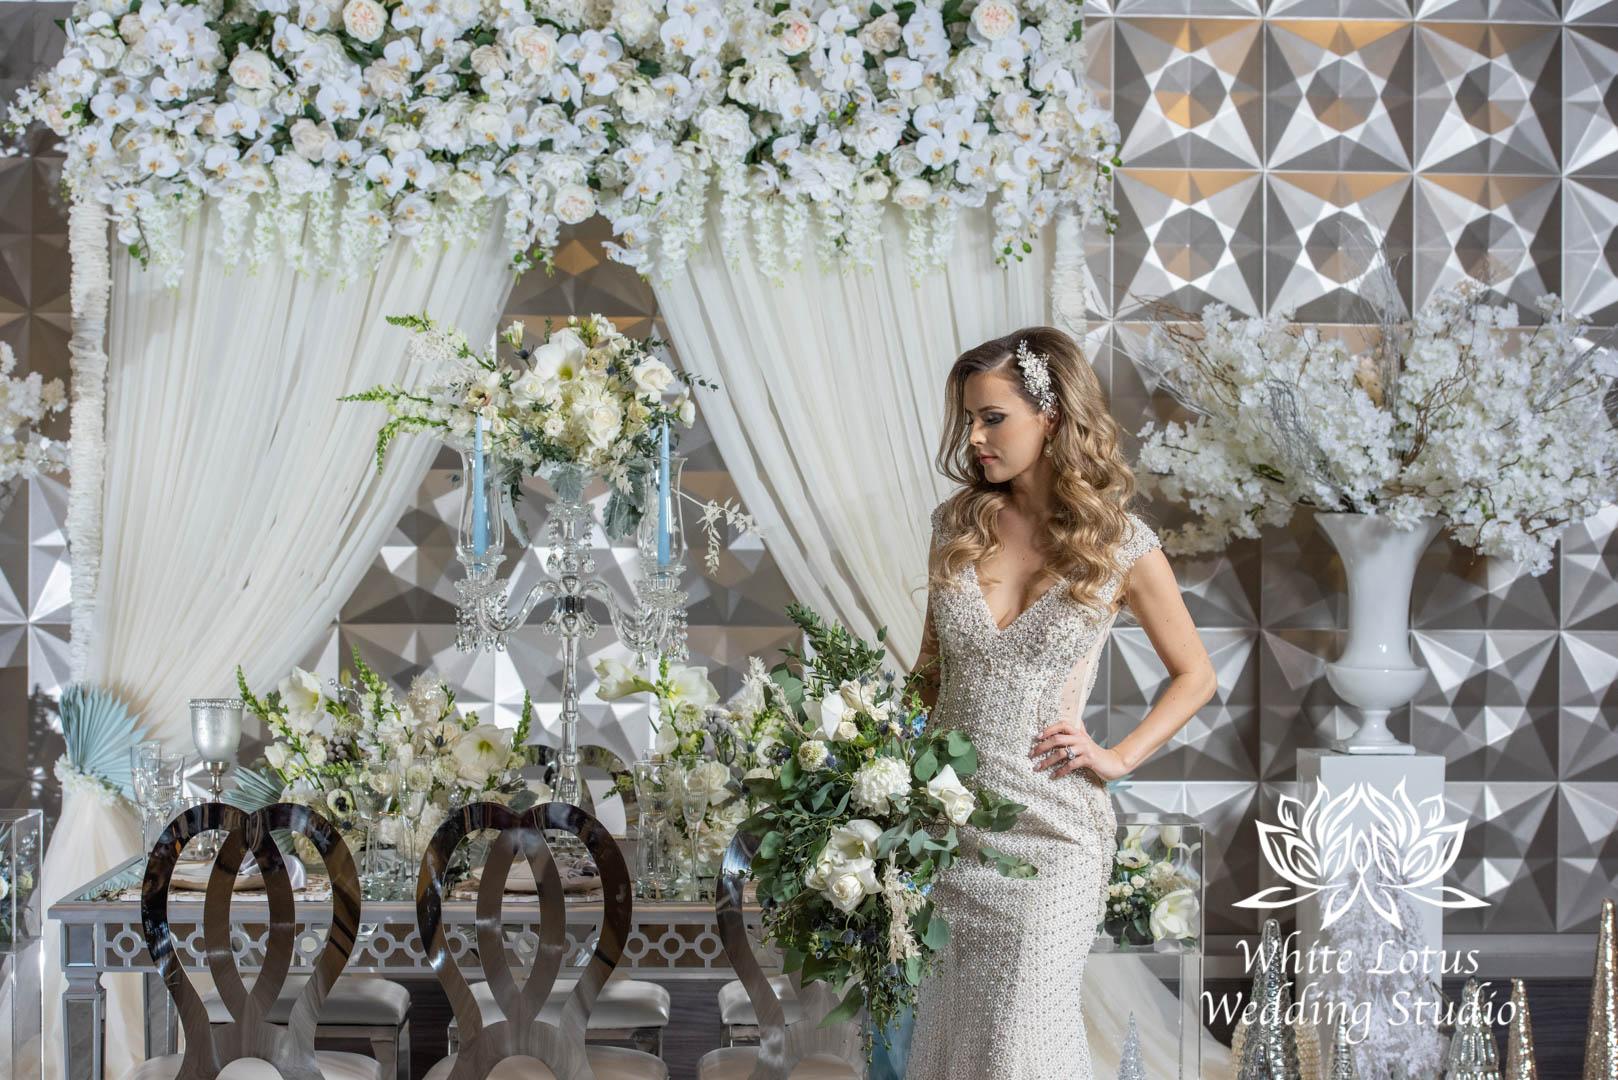 152- GLAM WINTERLUXE WEDDING INSPIRATION